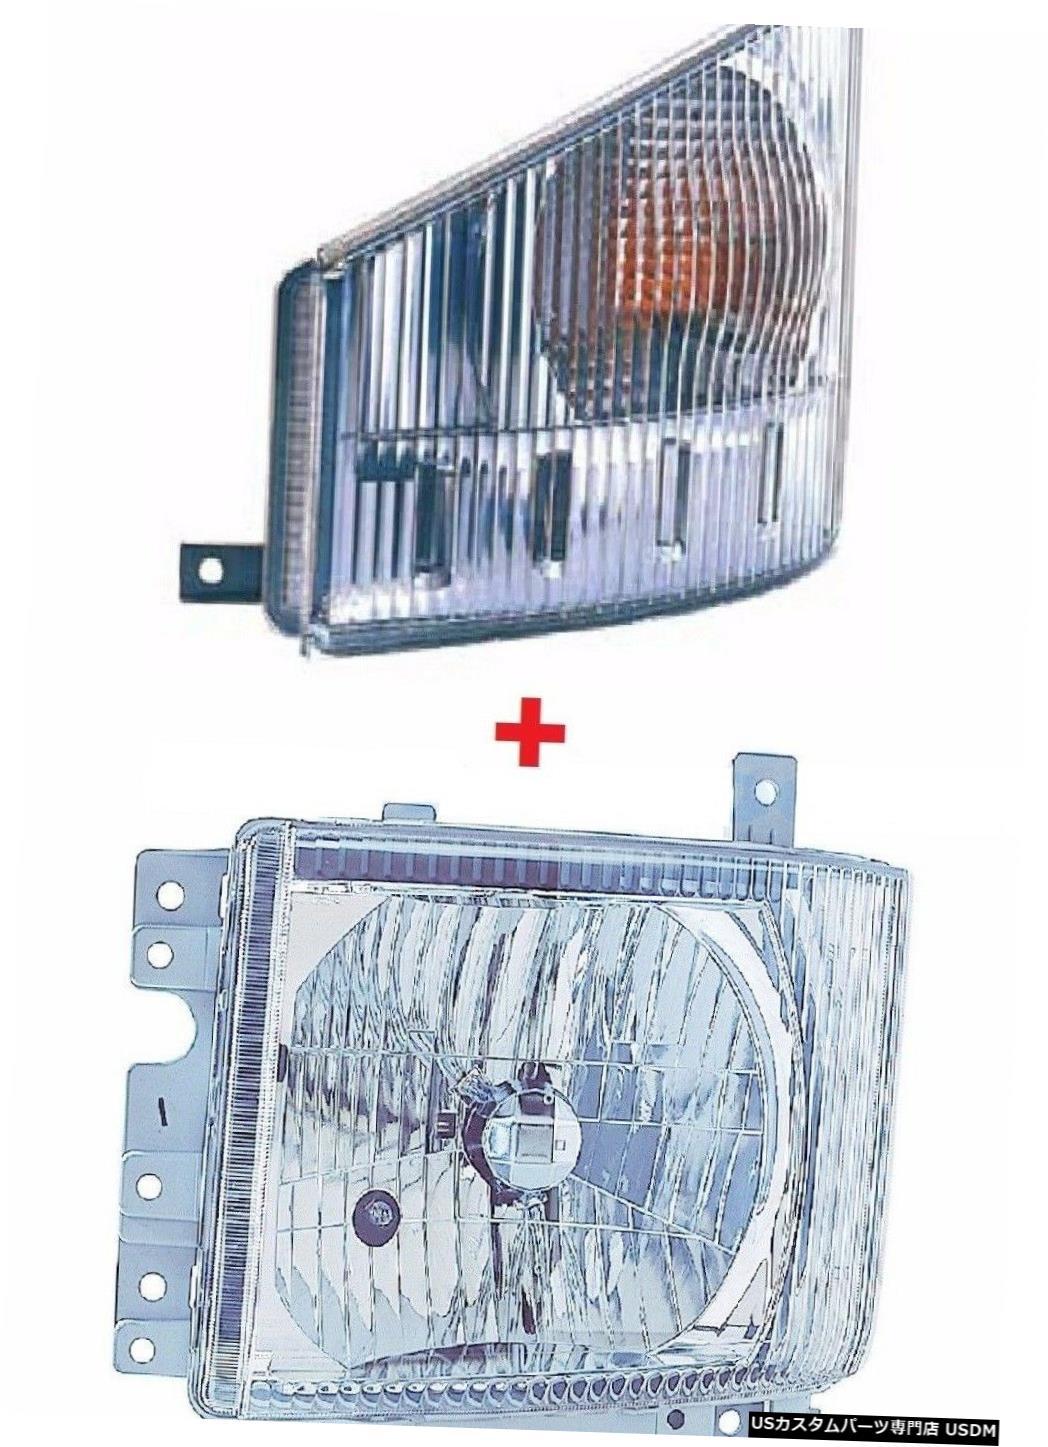 Headlight いすZ NPR NQR HD 2008-2015左ドライバートラックヘッドライトシグナルライト電球付き ISUZU NPR NQR HD 2008-2015 LEFT DRIVER TRUCK HEADLIGHT SIGNAL LIGHT NEW W/BULBS